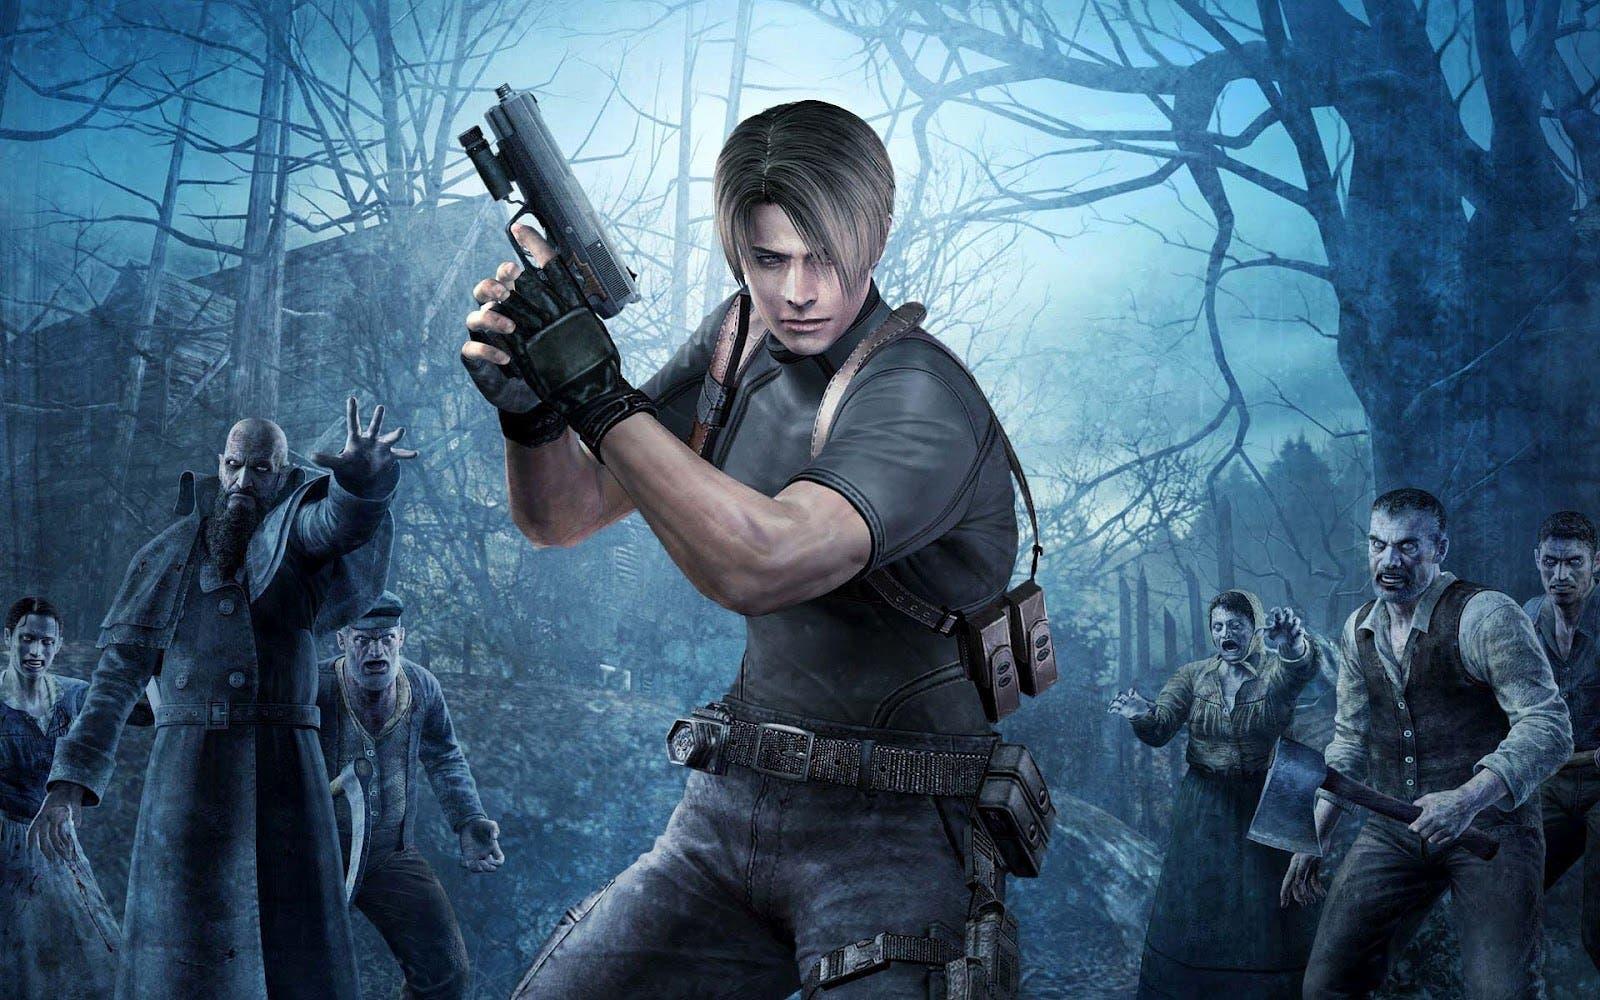 Retro análisis de Resident Evil 4 – Xbox Series X|S 1